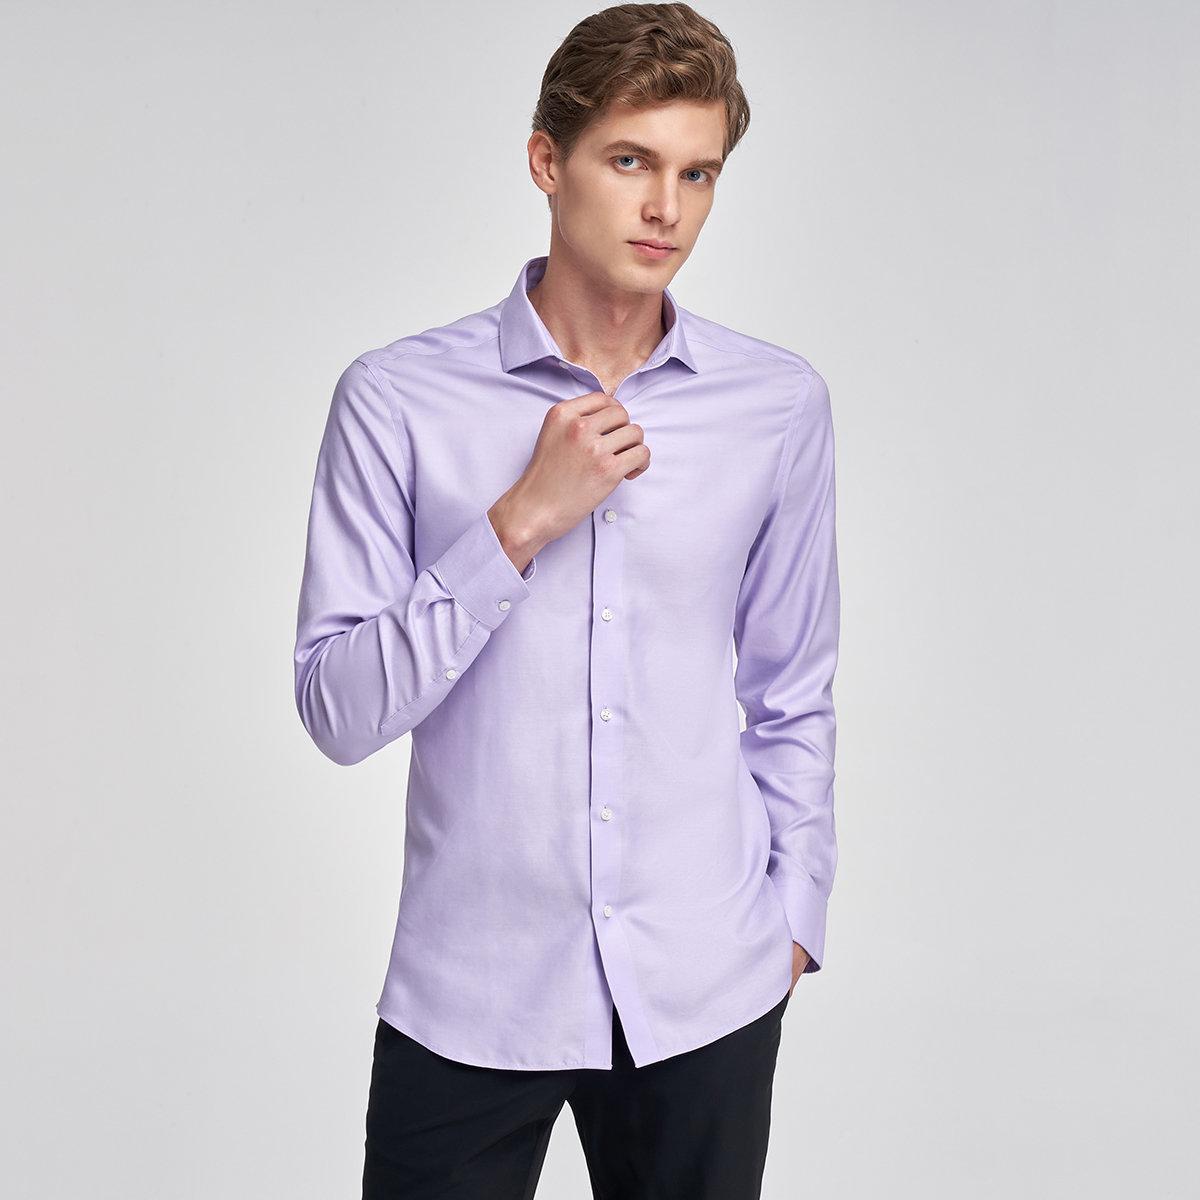 【Non-iron】MEN'S Long Sleeve Shirt(purple)